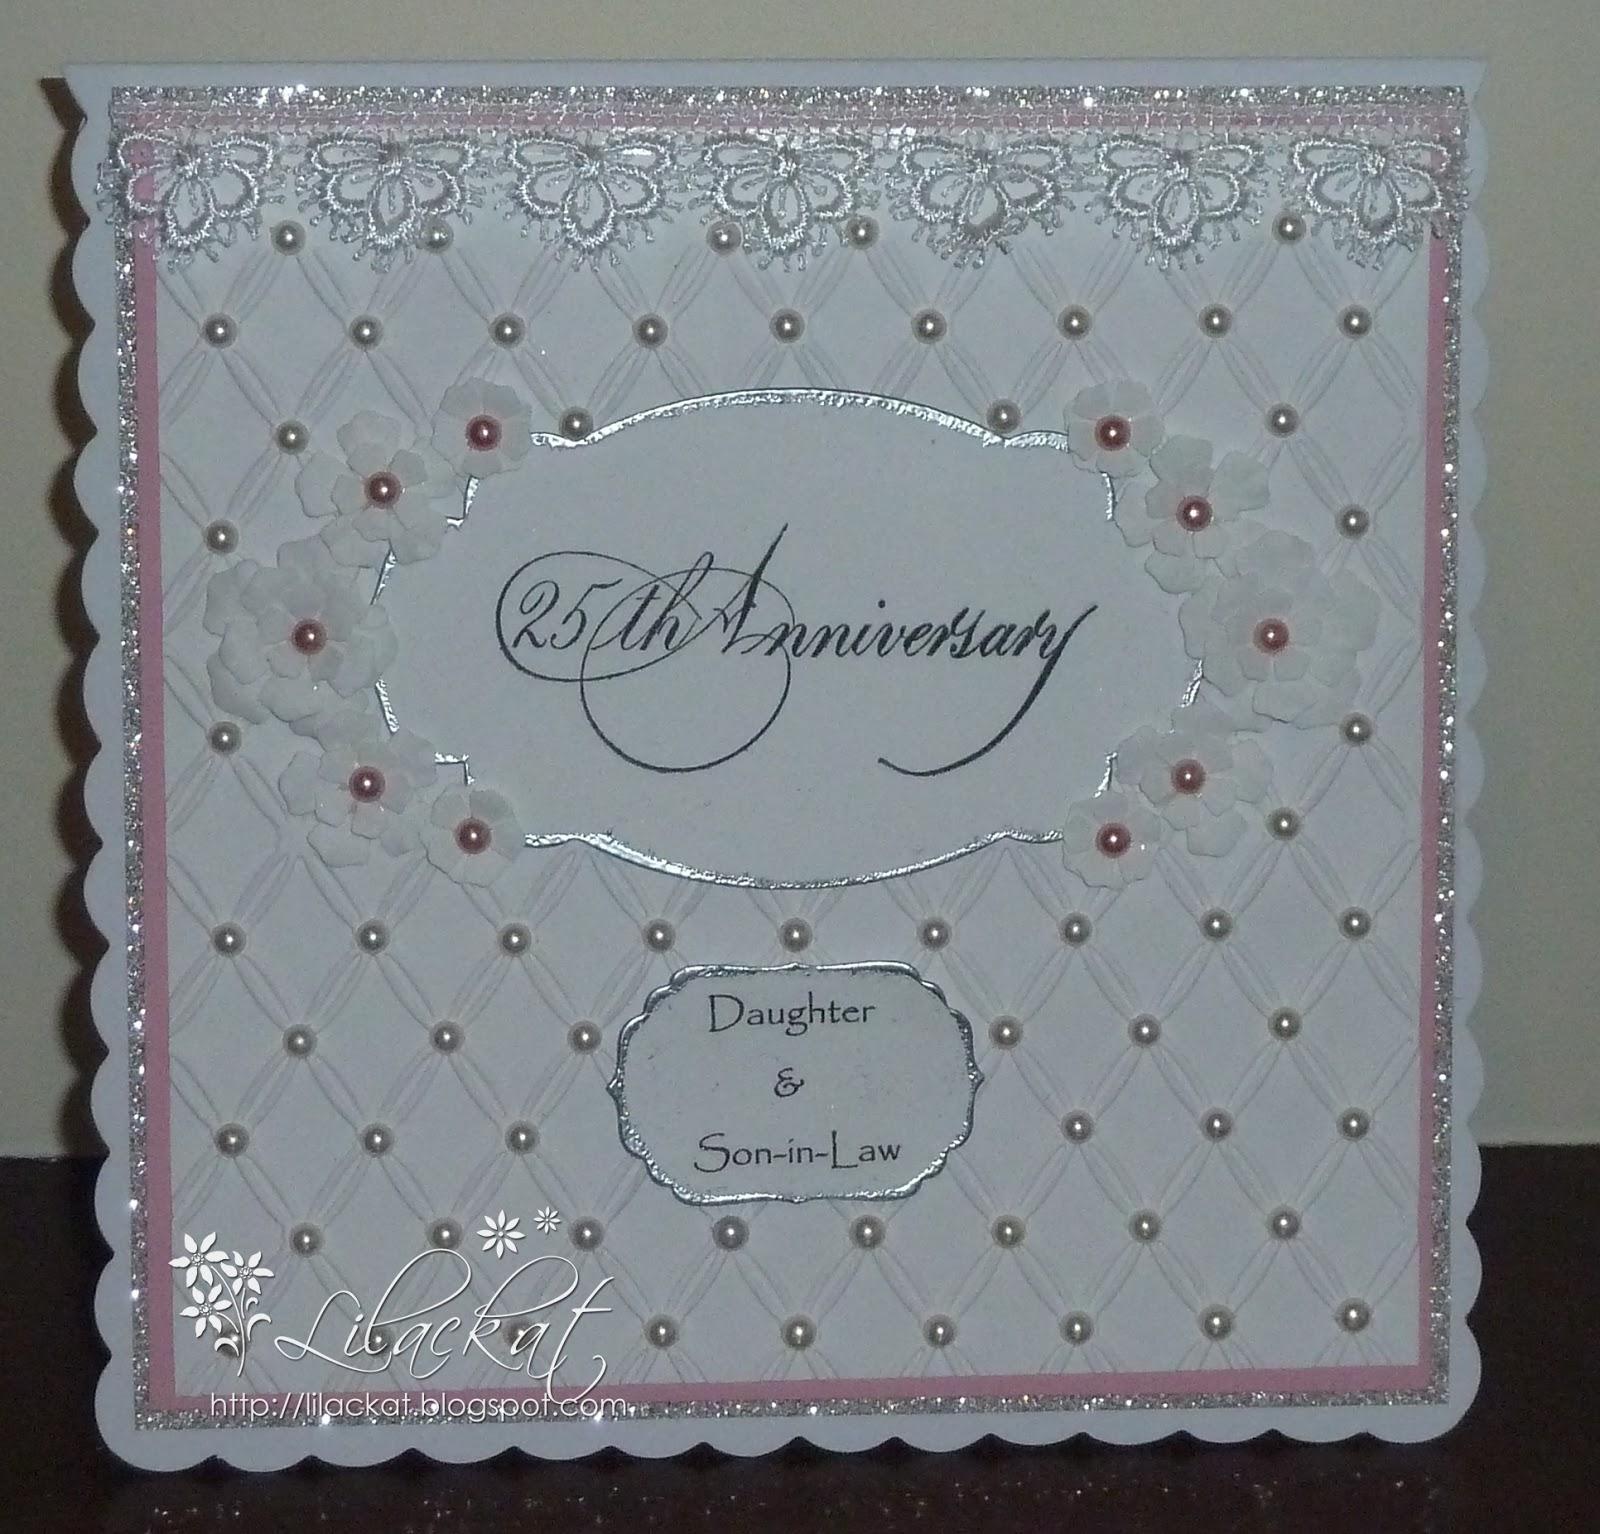 Lilackat Special Silver Wedding Anniversary Card